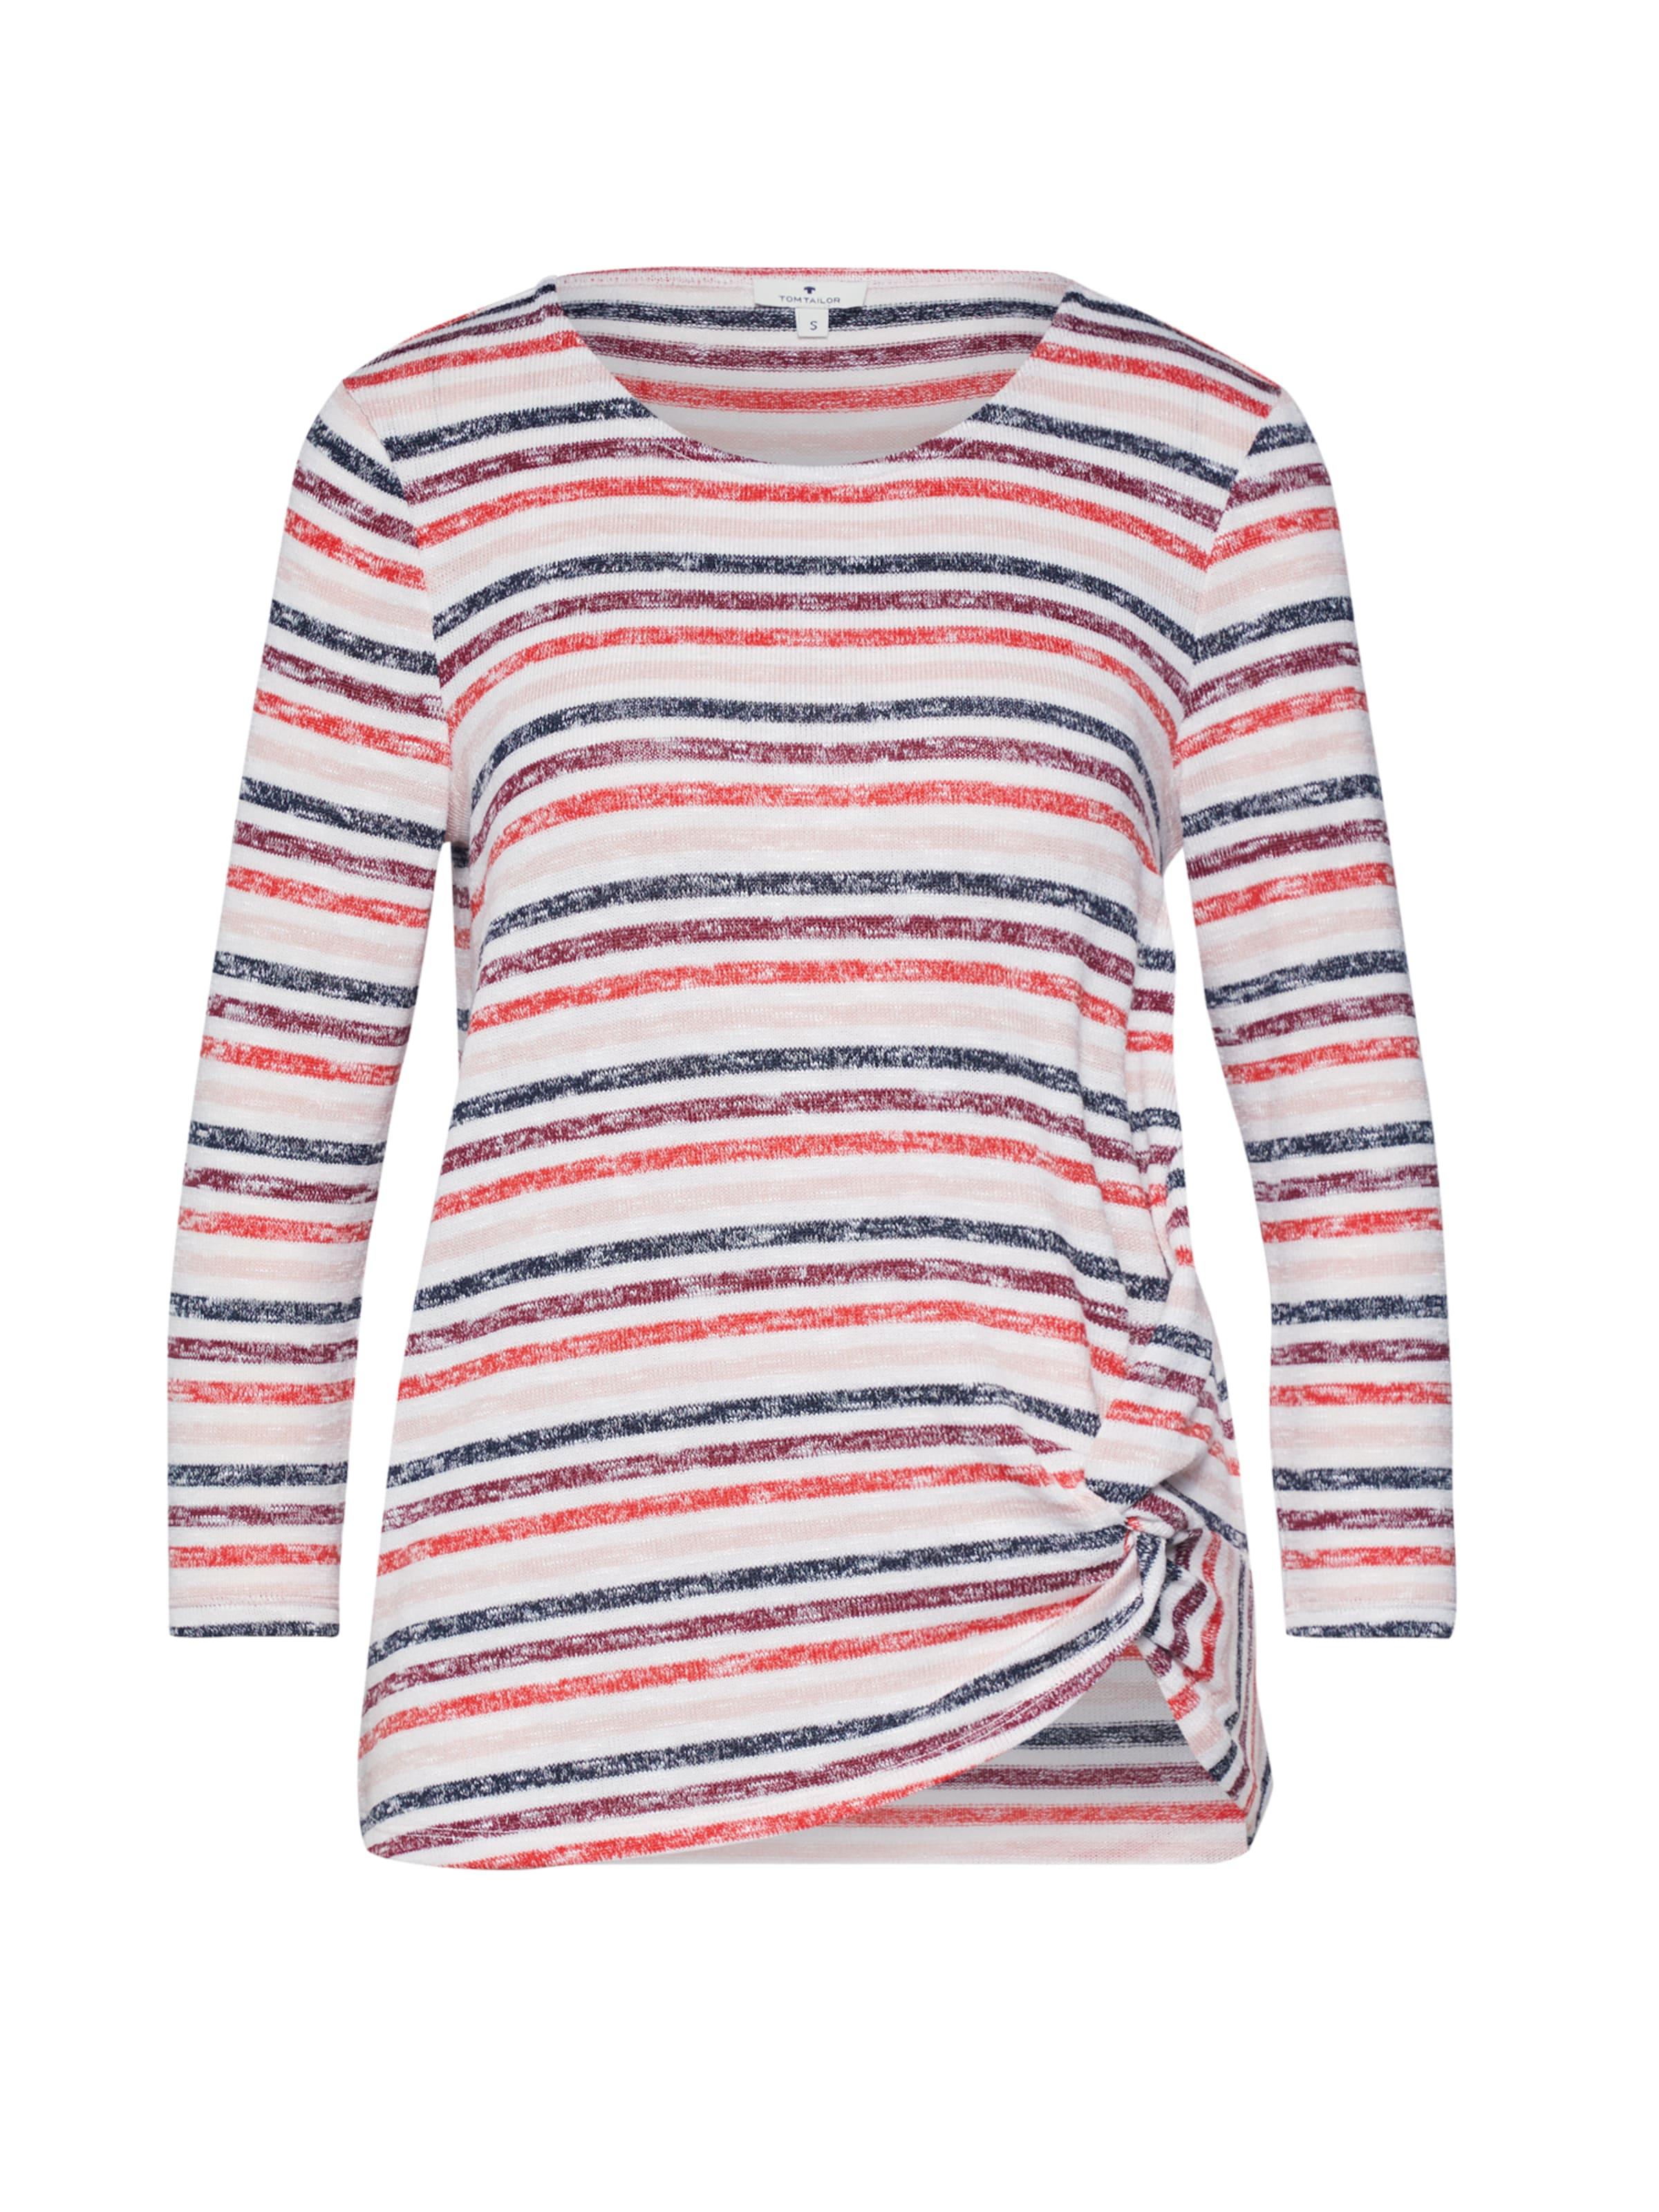 T In Mischfarben Tom shirt Tailor 4Aj35RL